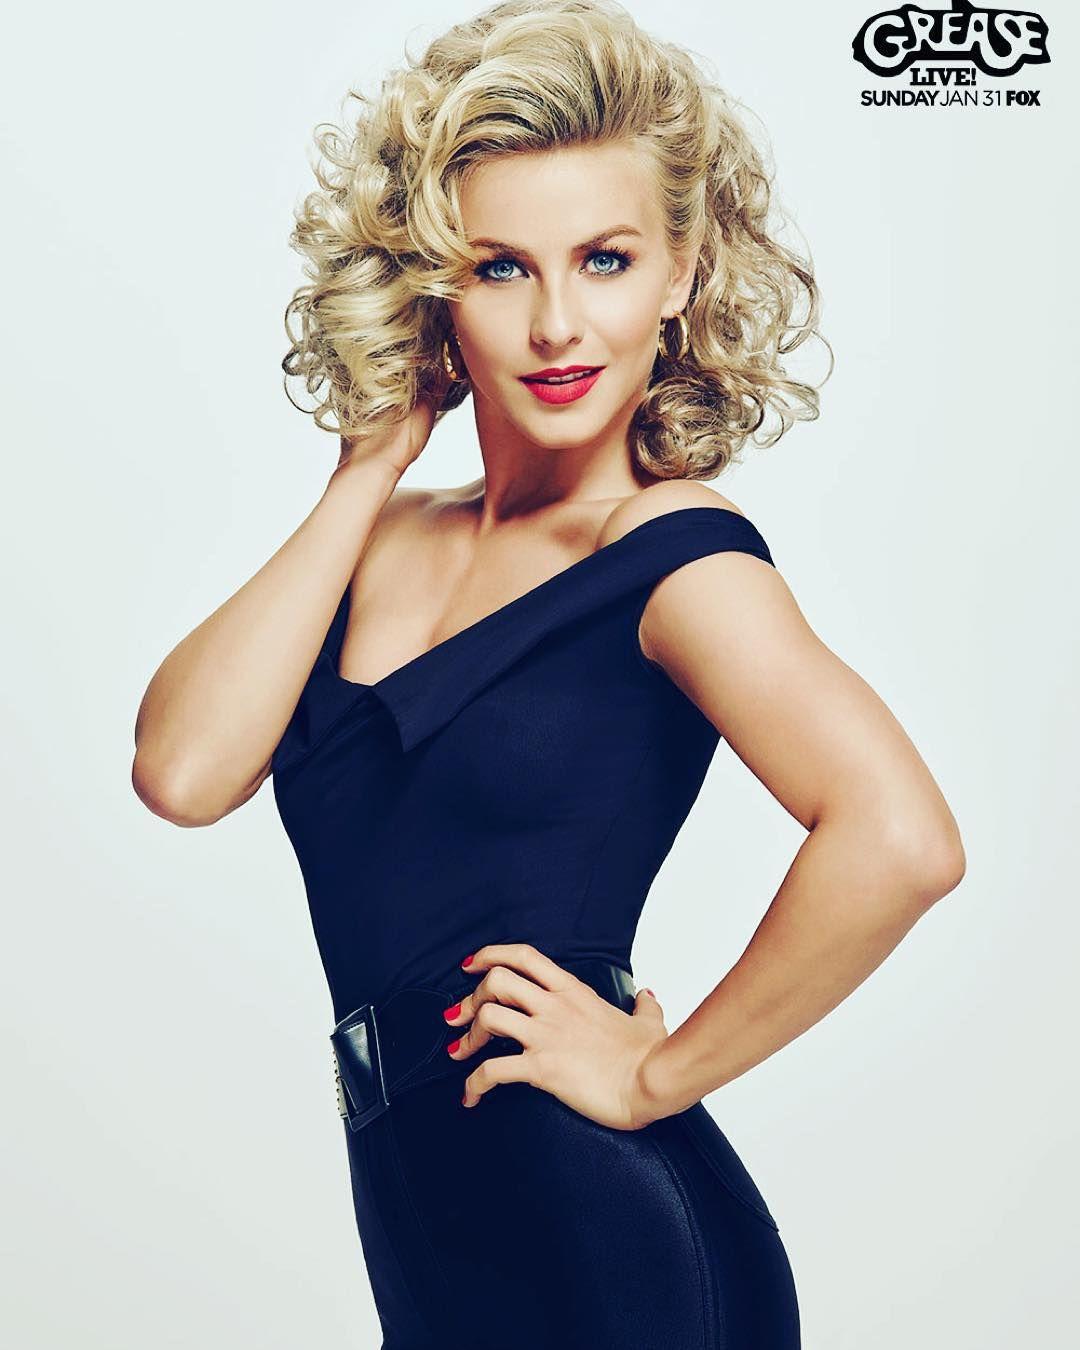 Julianne Hough looks Beautiful! #GreaseLive